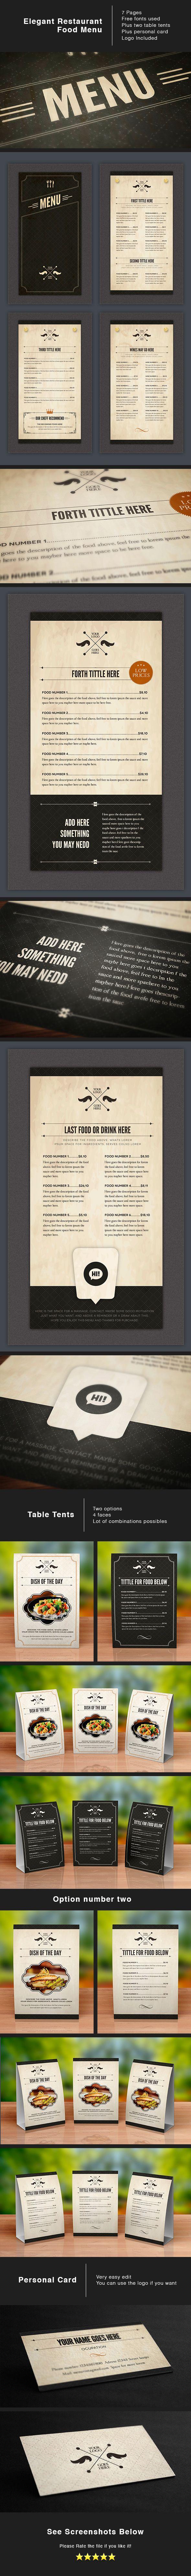 White apron menu warrington - Elegent Restaurant Menu Design